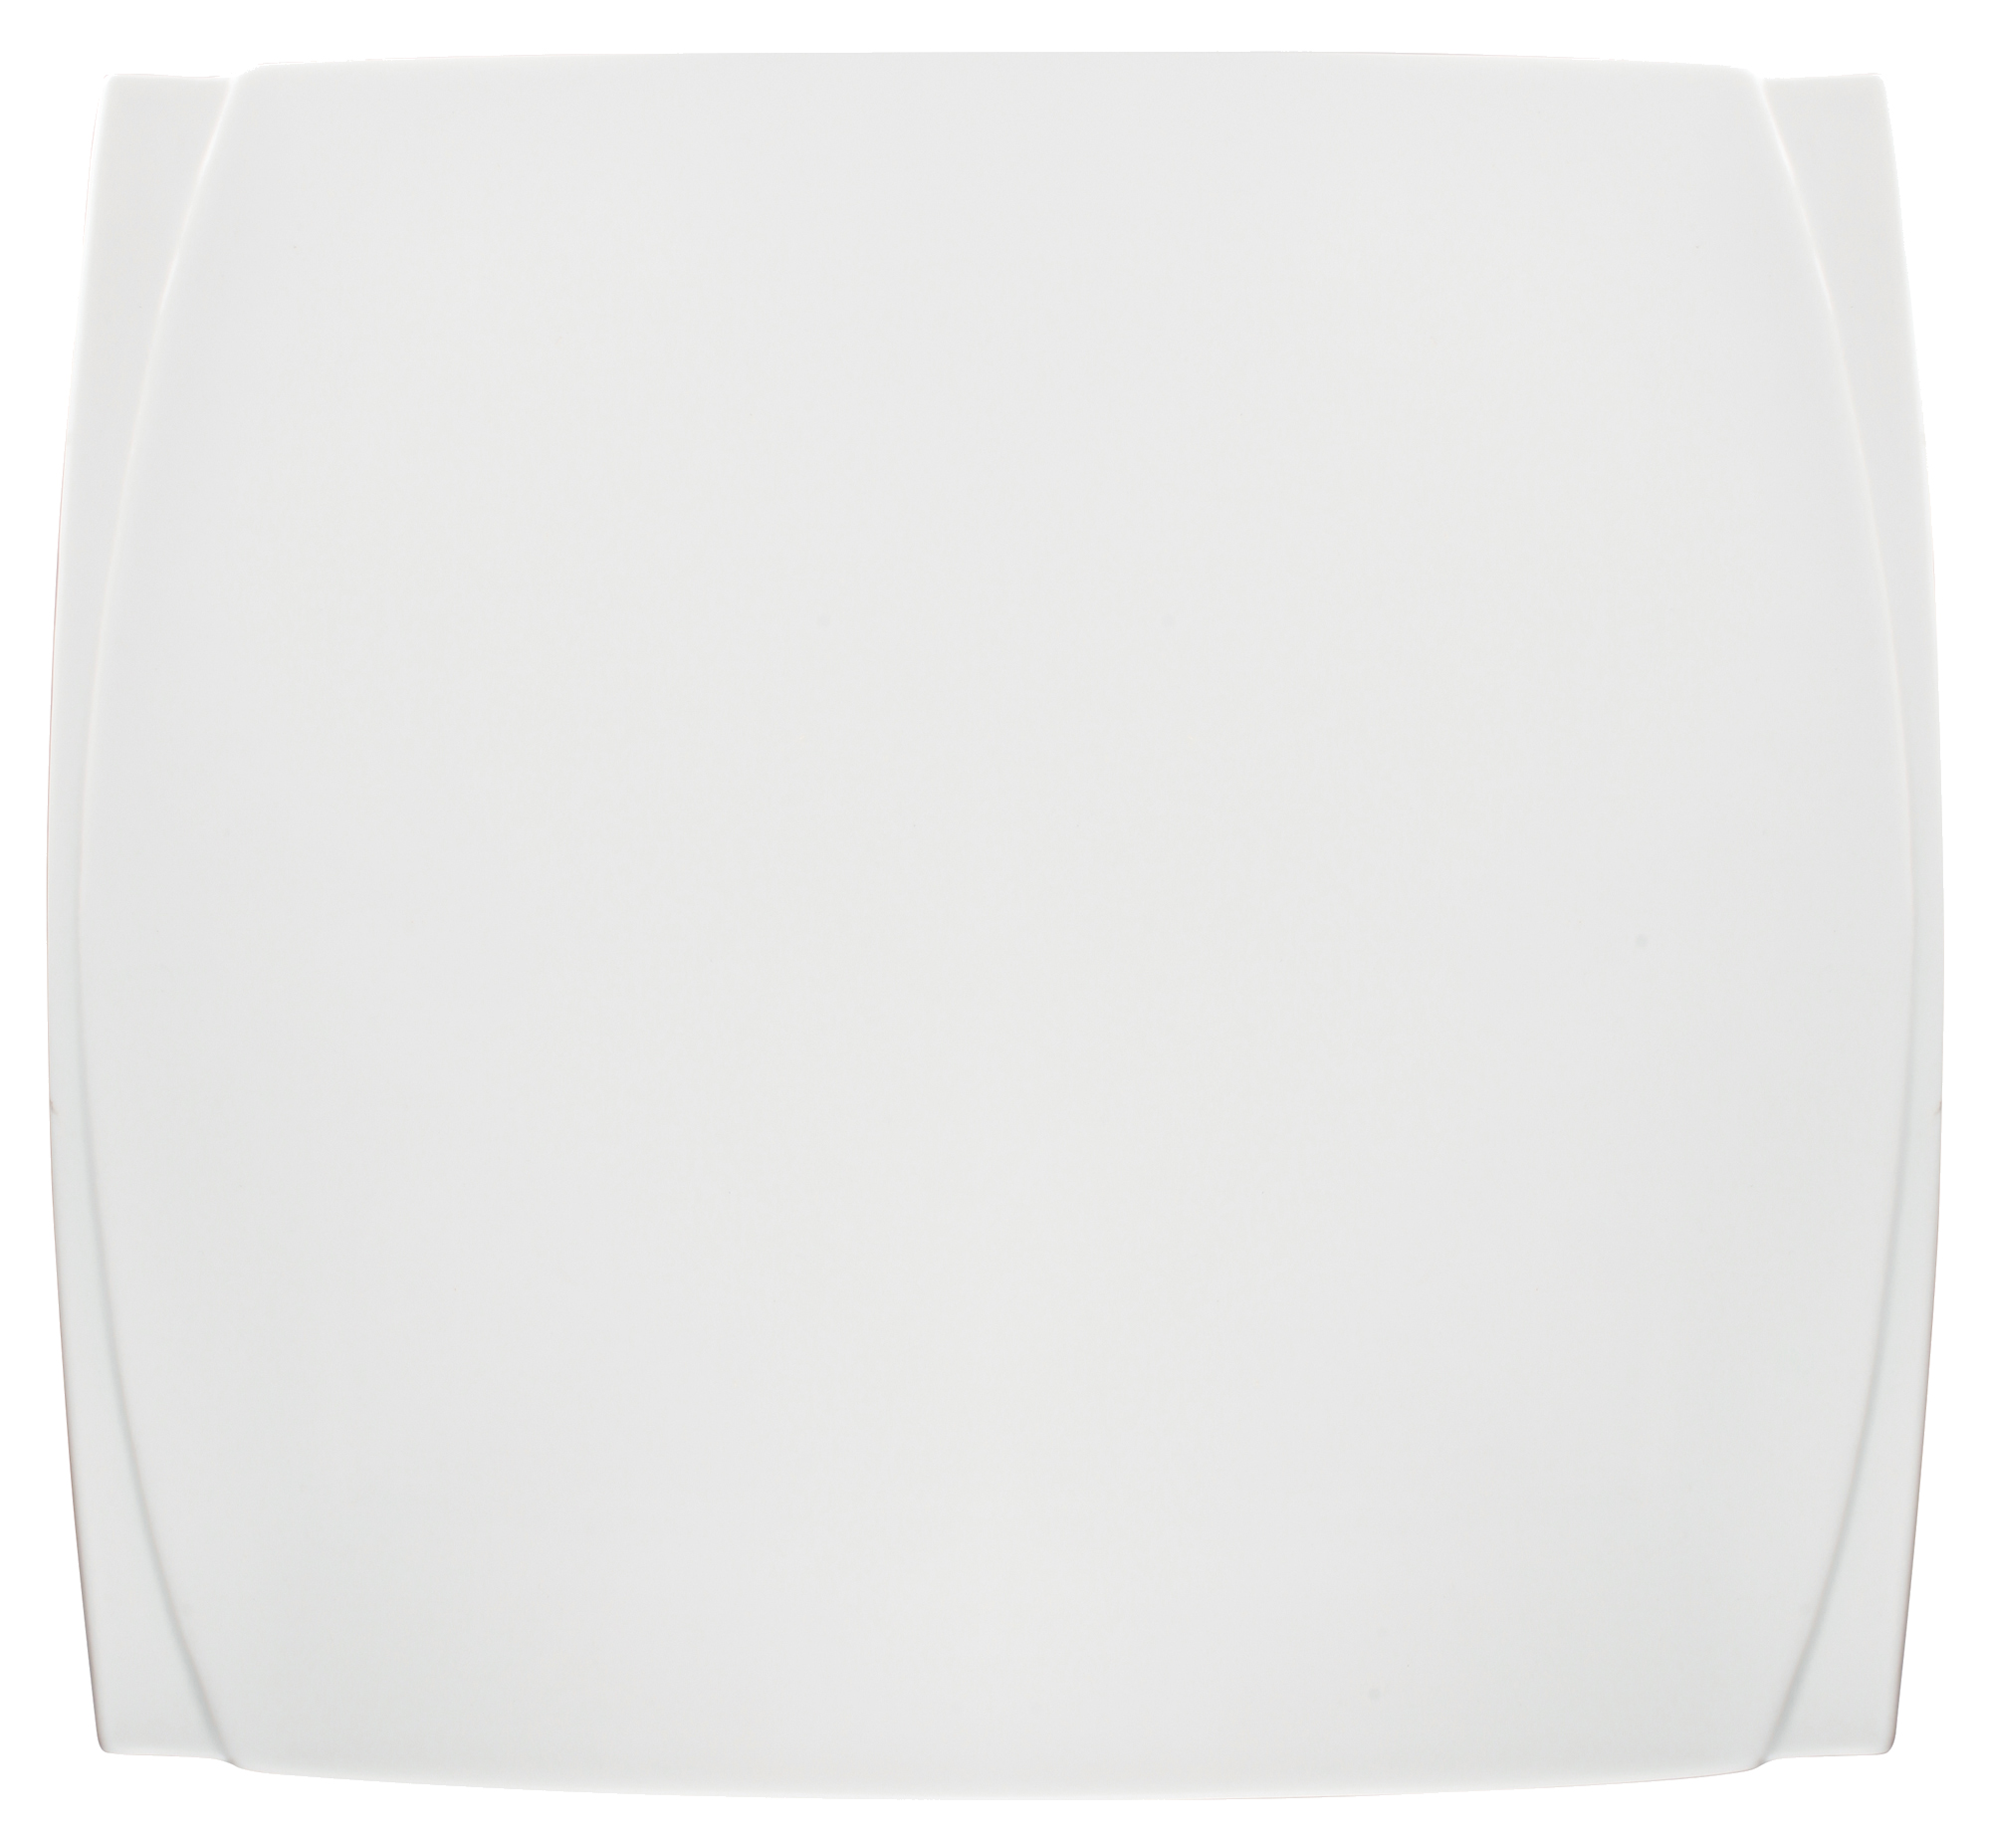 Winco WDP009-102 plate, china